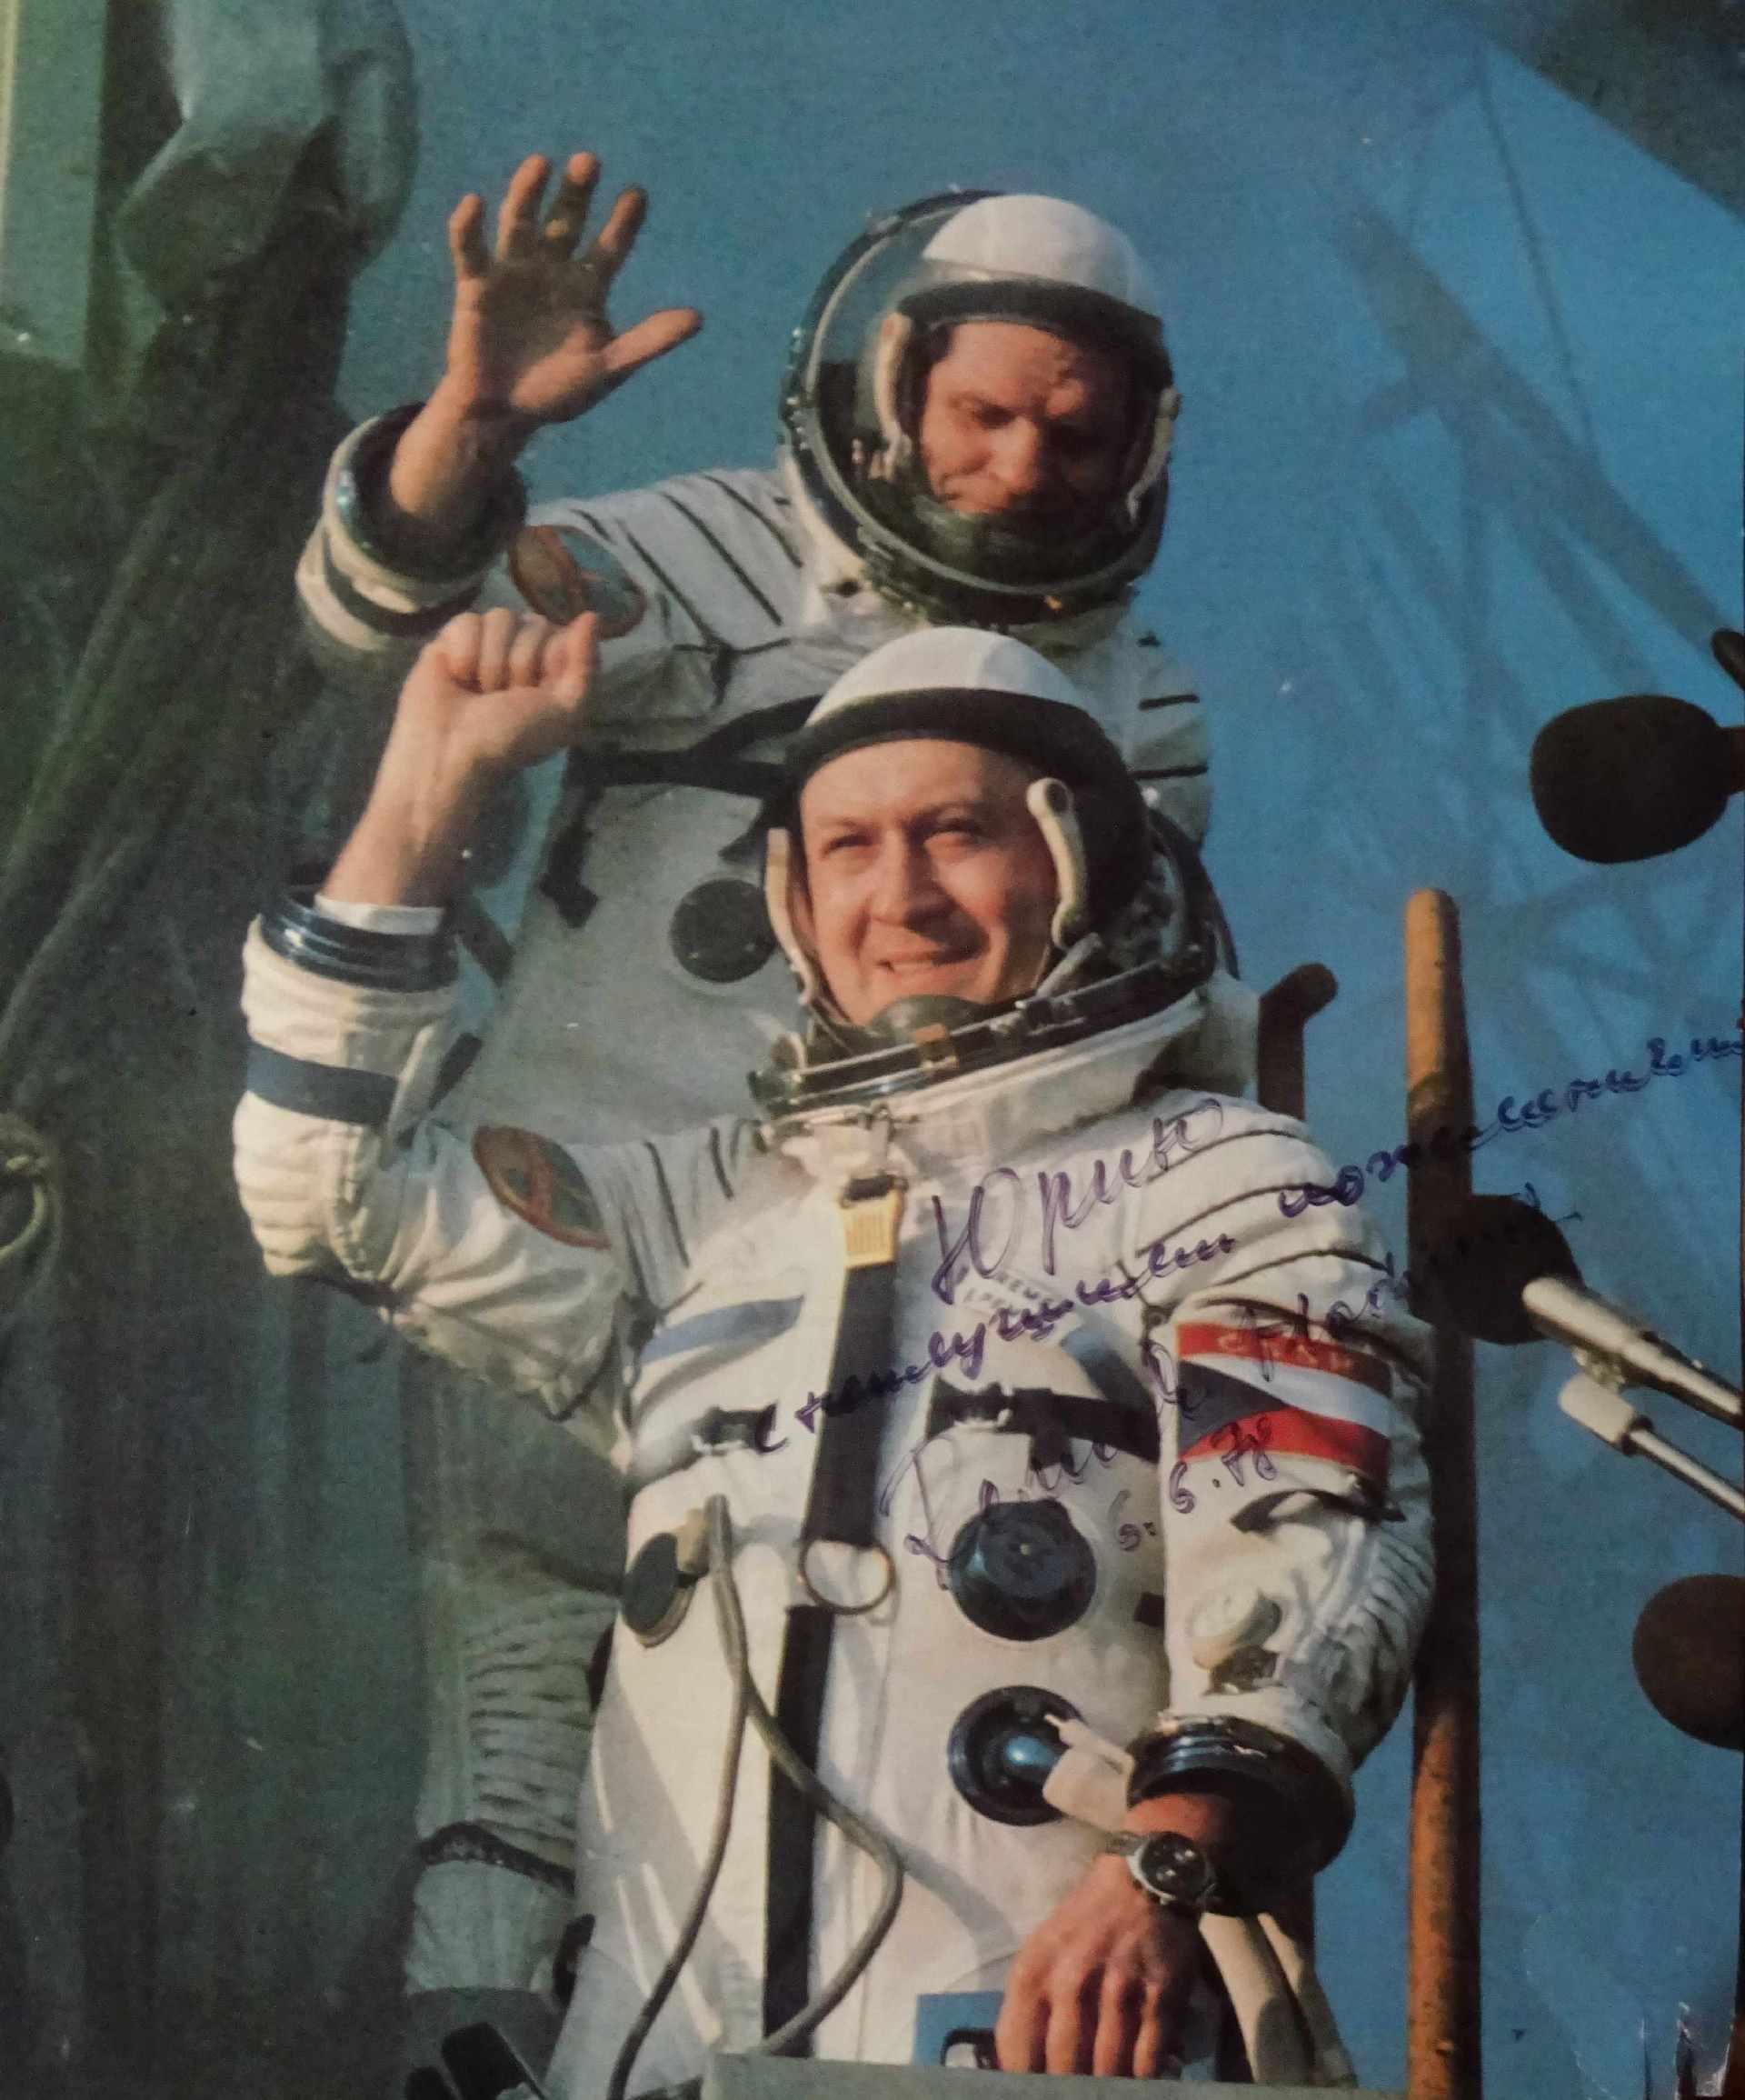 Экспонат #31. «Союз-28». 2 марта 1978 года